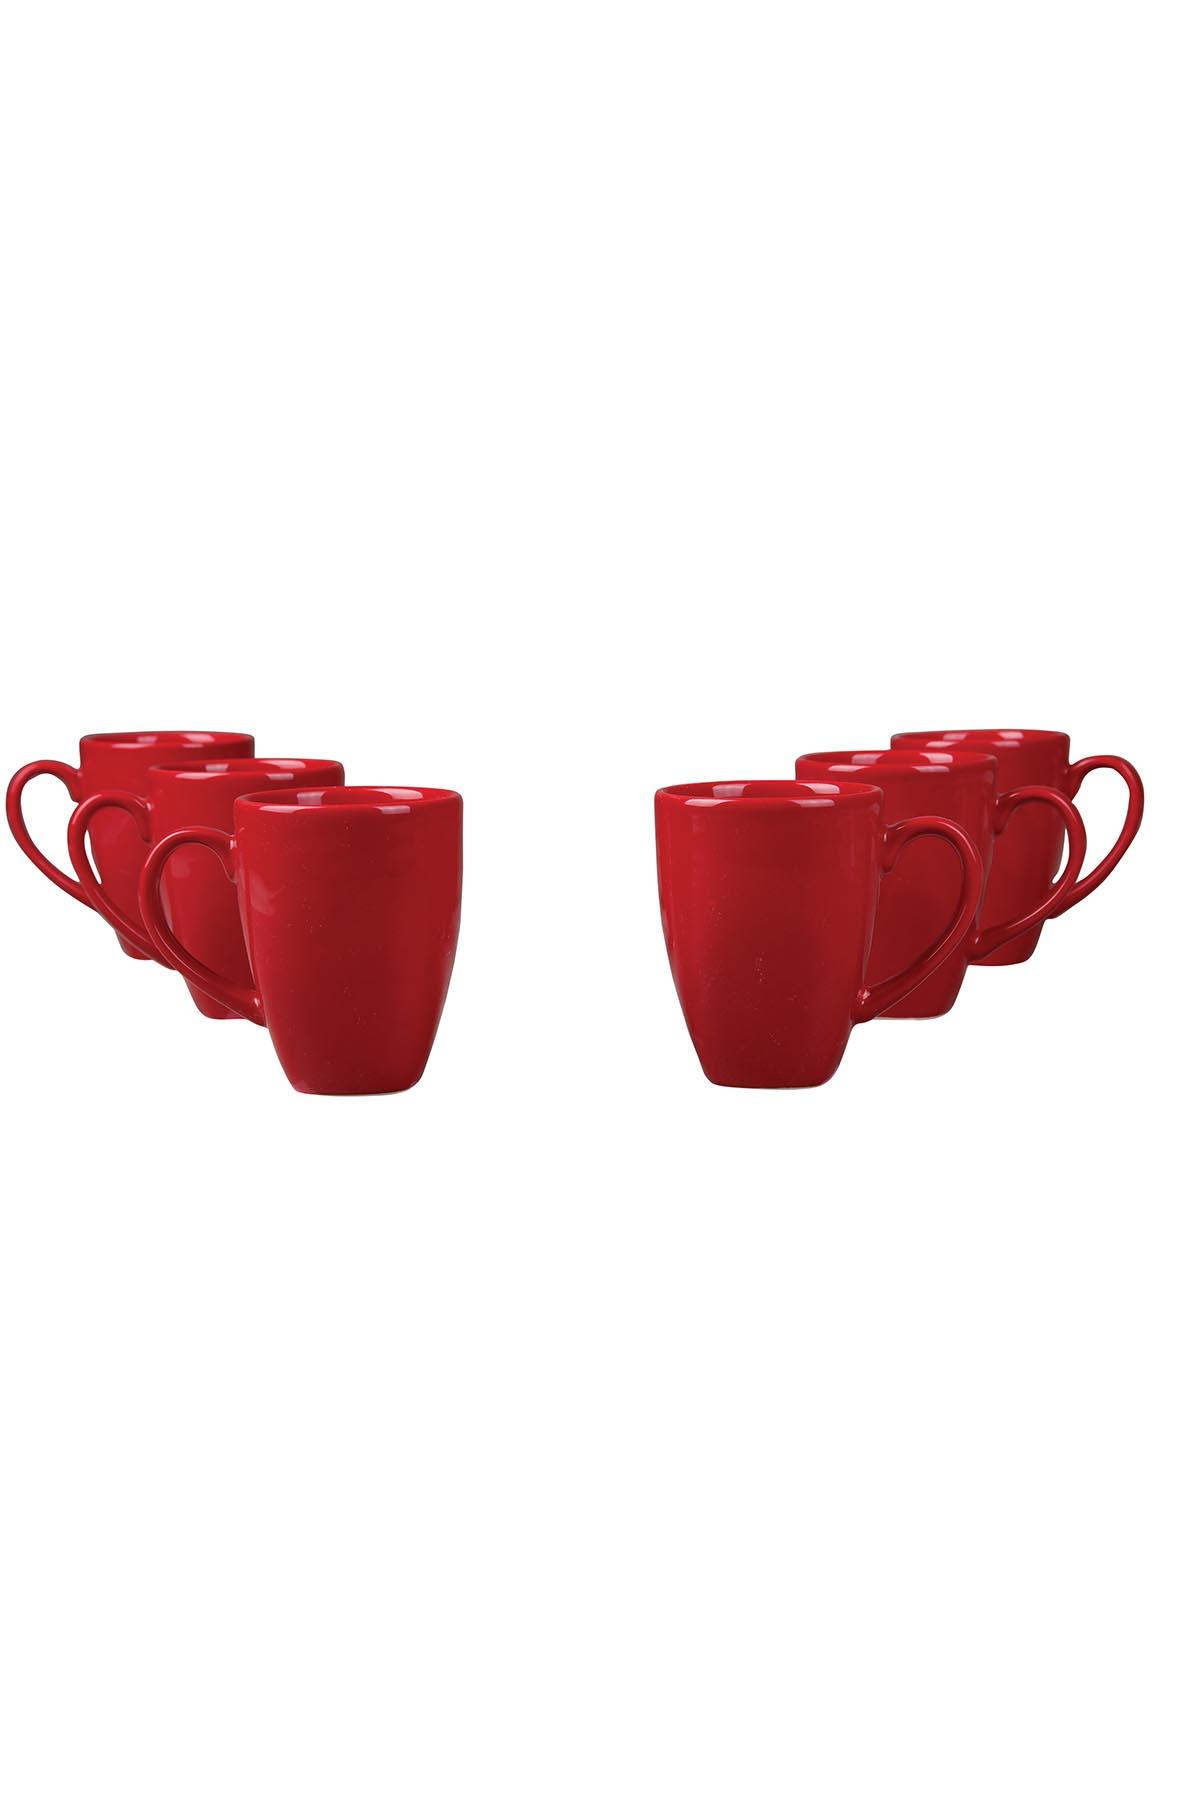 Naturaceram 6'lı Prizma Mug Kırmızı Renk